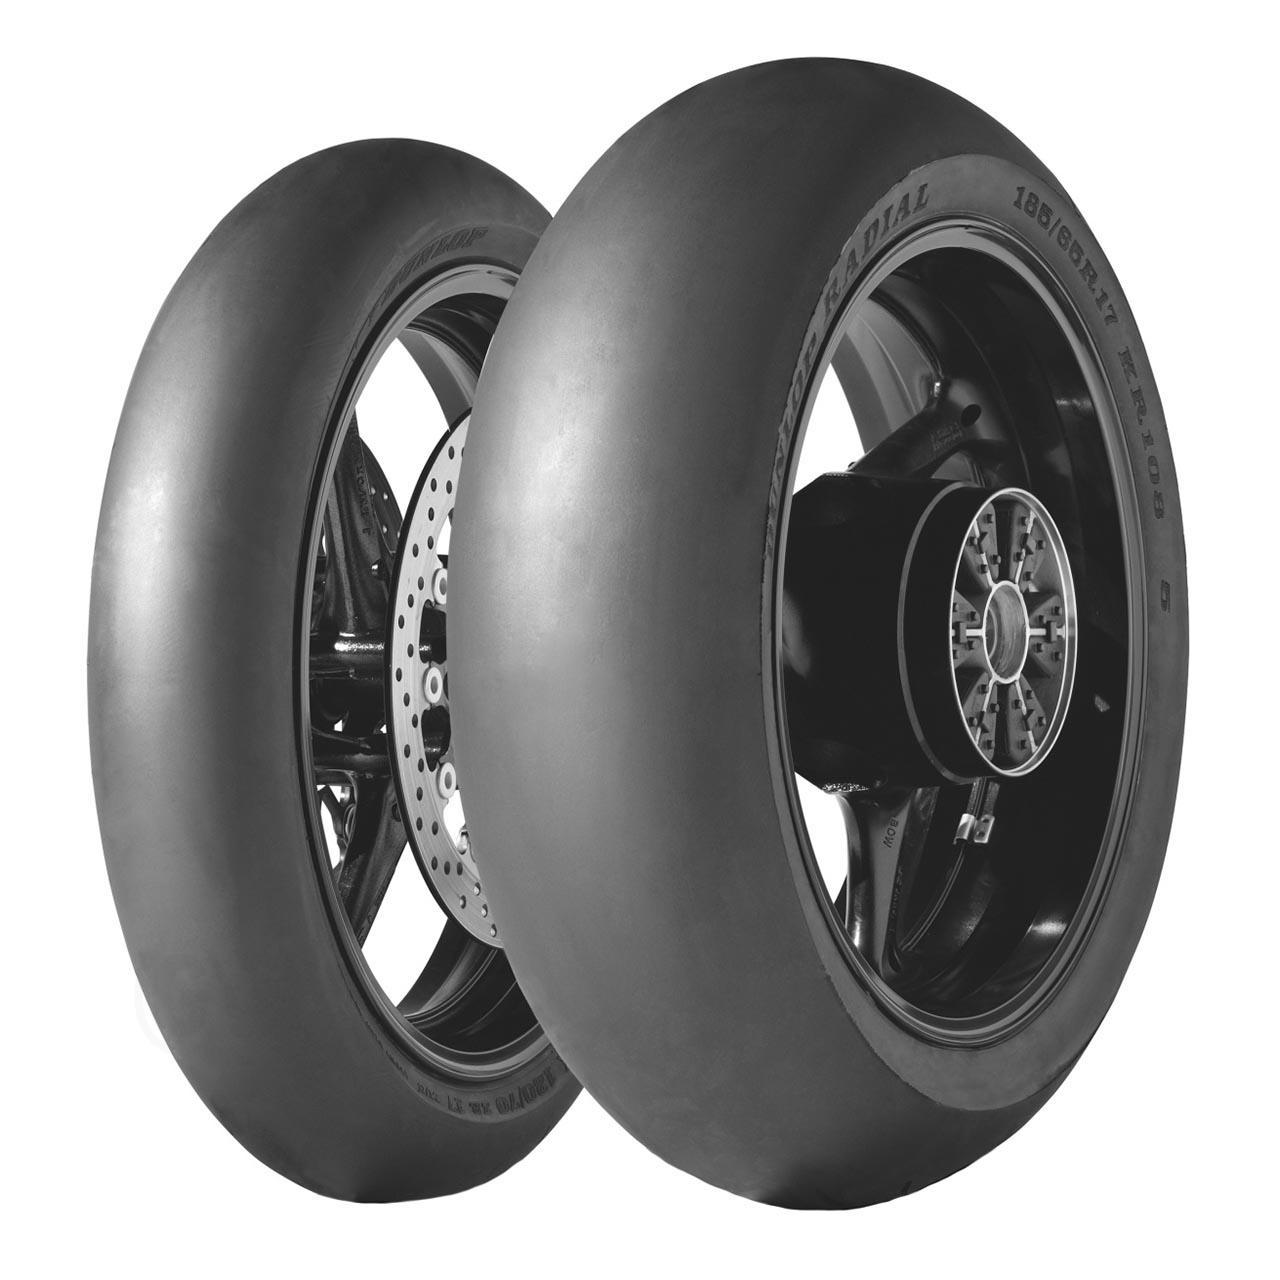 Dunlop KR 108 MS2 H998 Rear NHS 195/65R17 TL